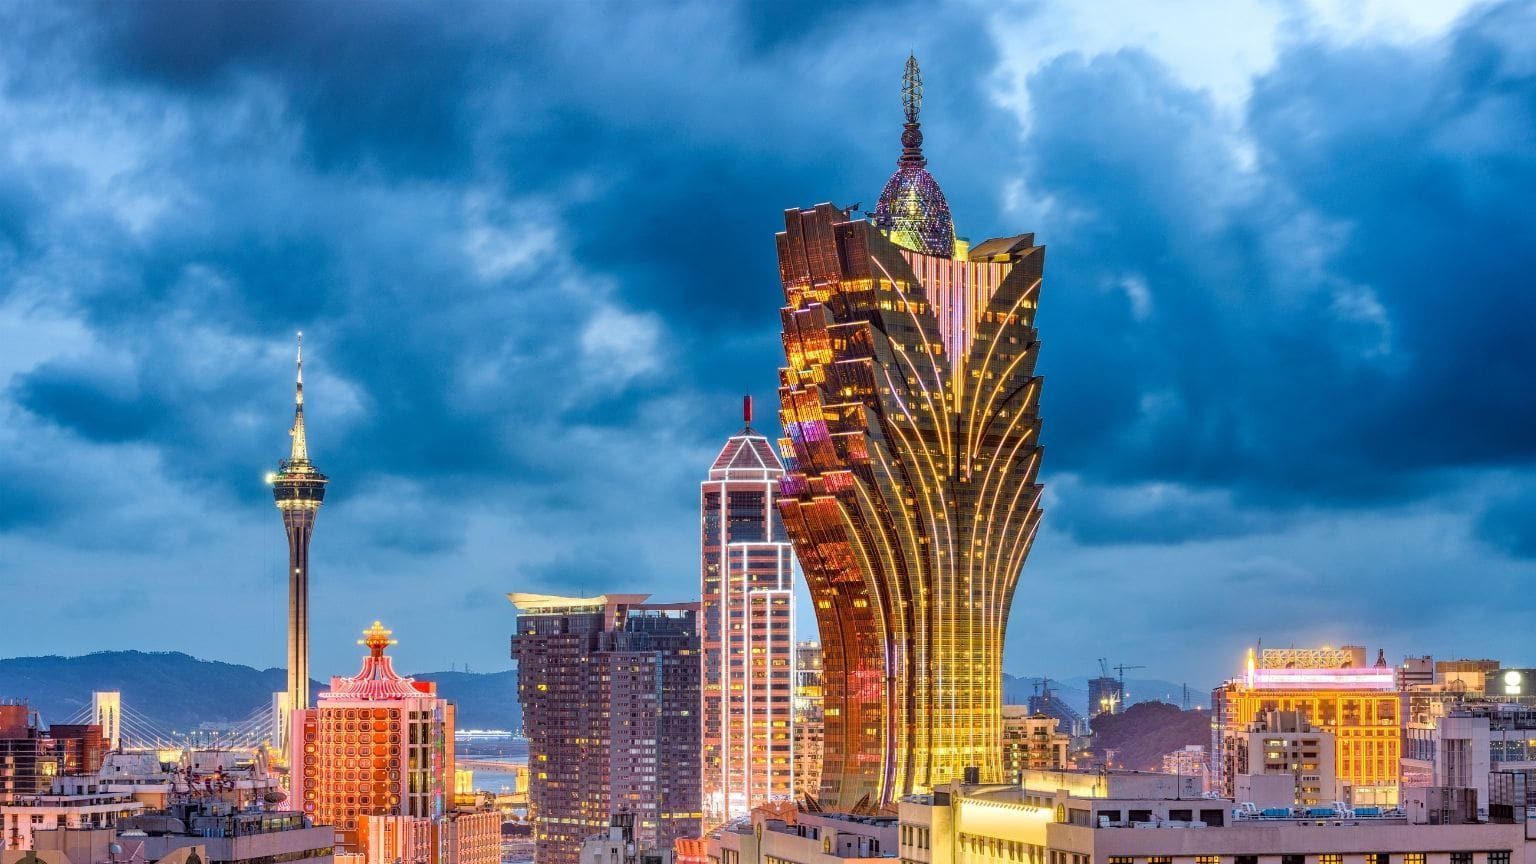 Macau city skyline at dusk